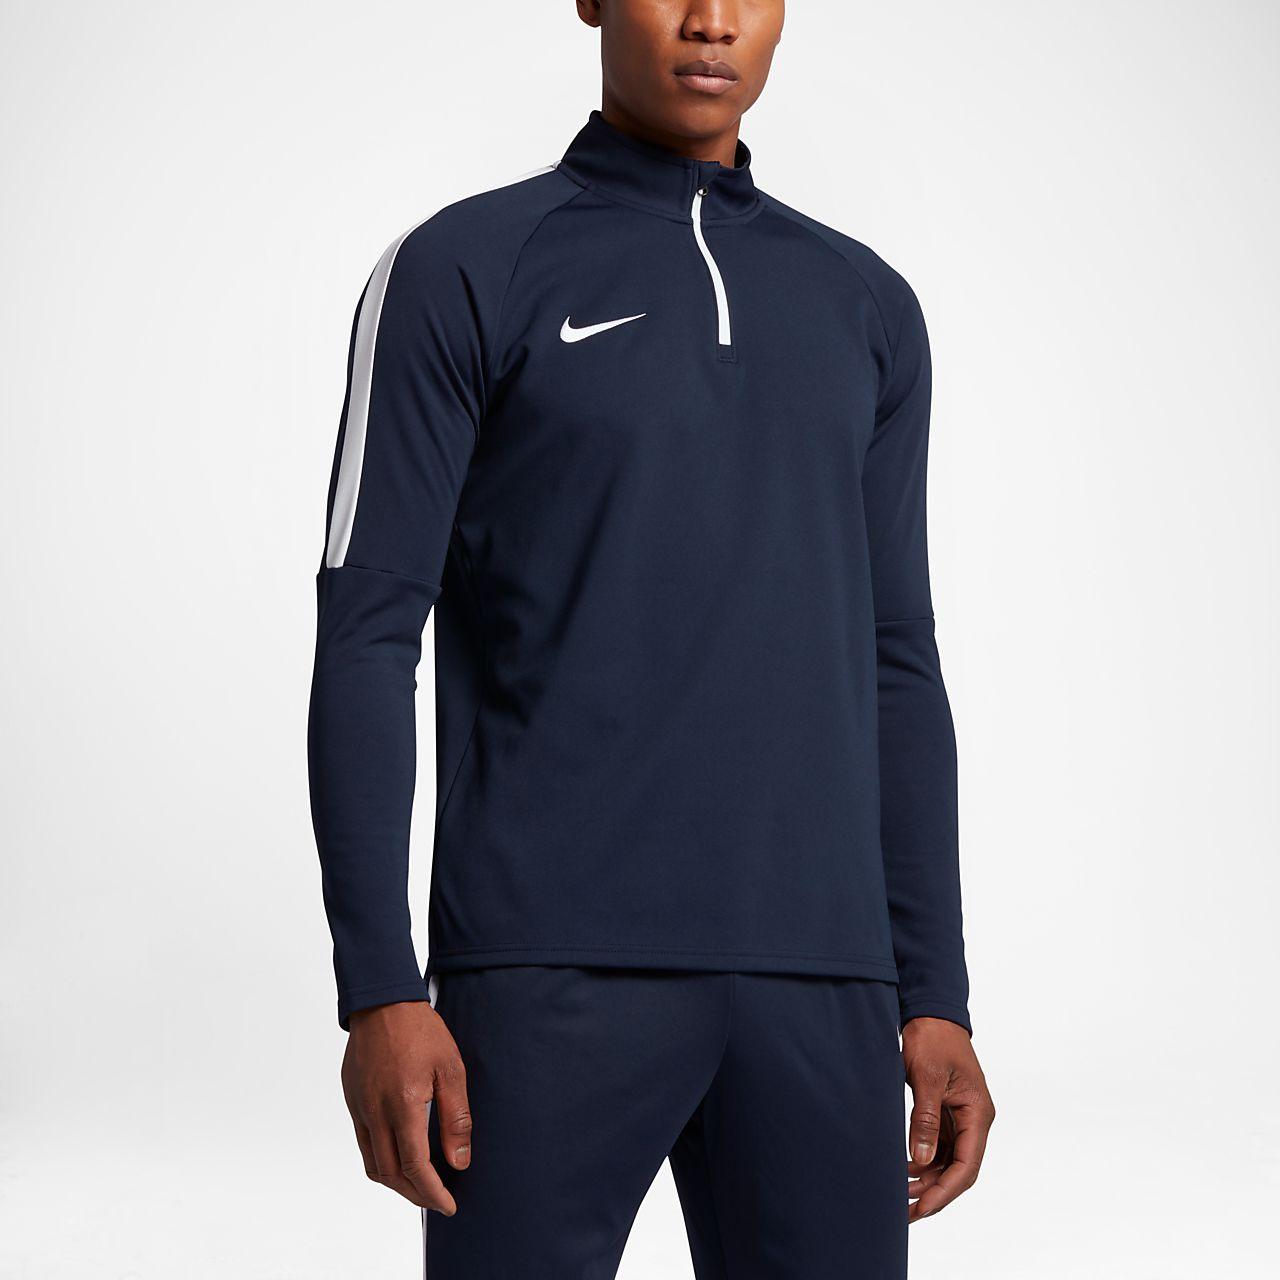 Nike De Pour Academy Homme Zip Football Dri Haut Fr Fit 14 UqI6g